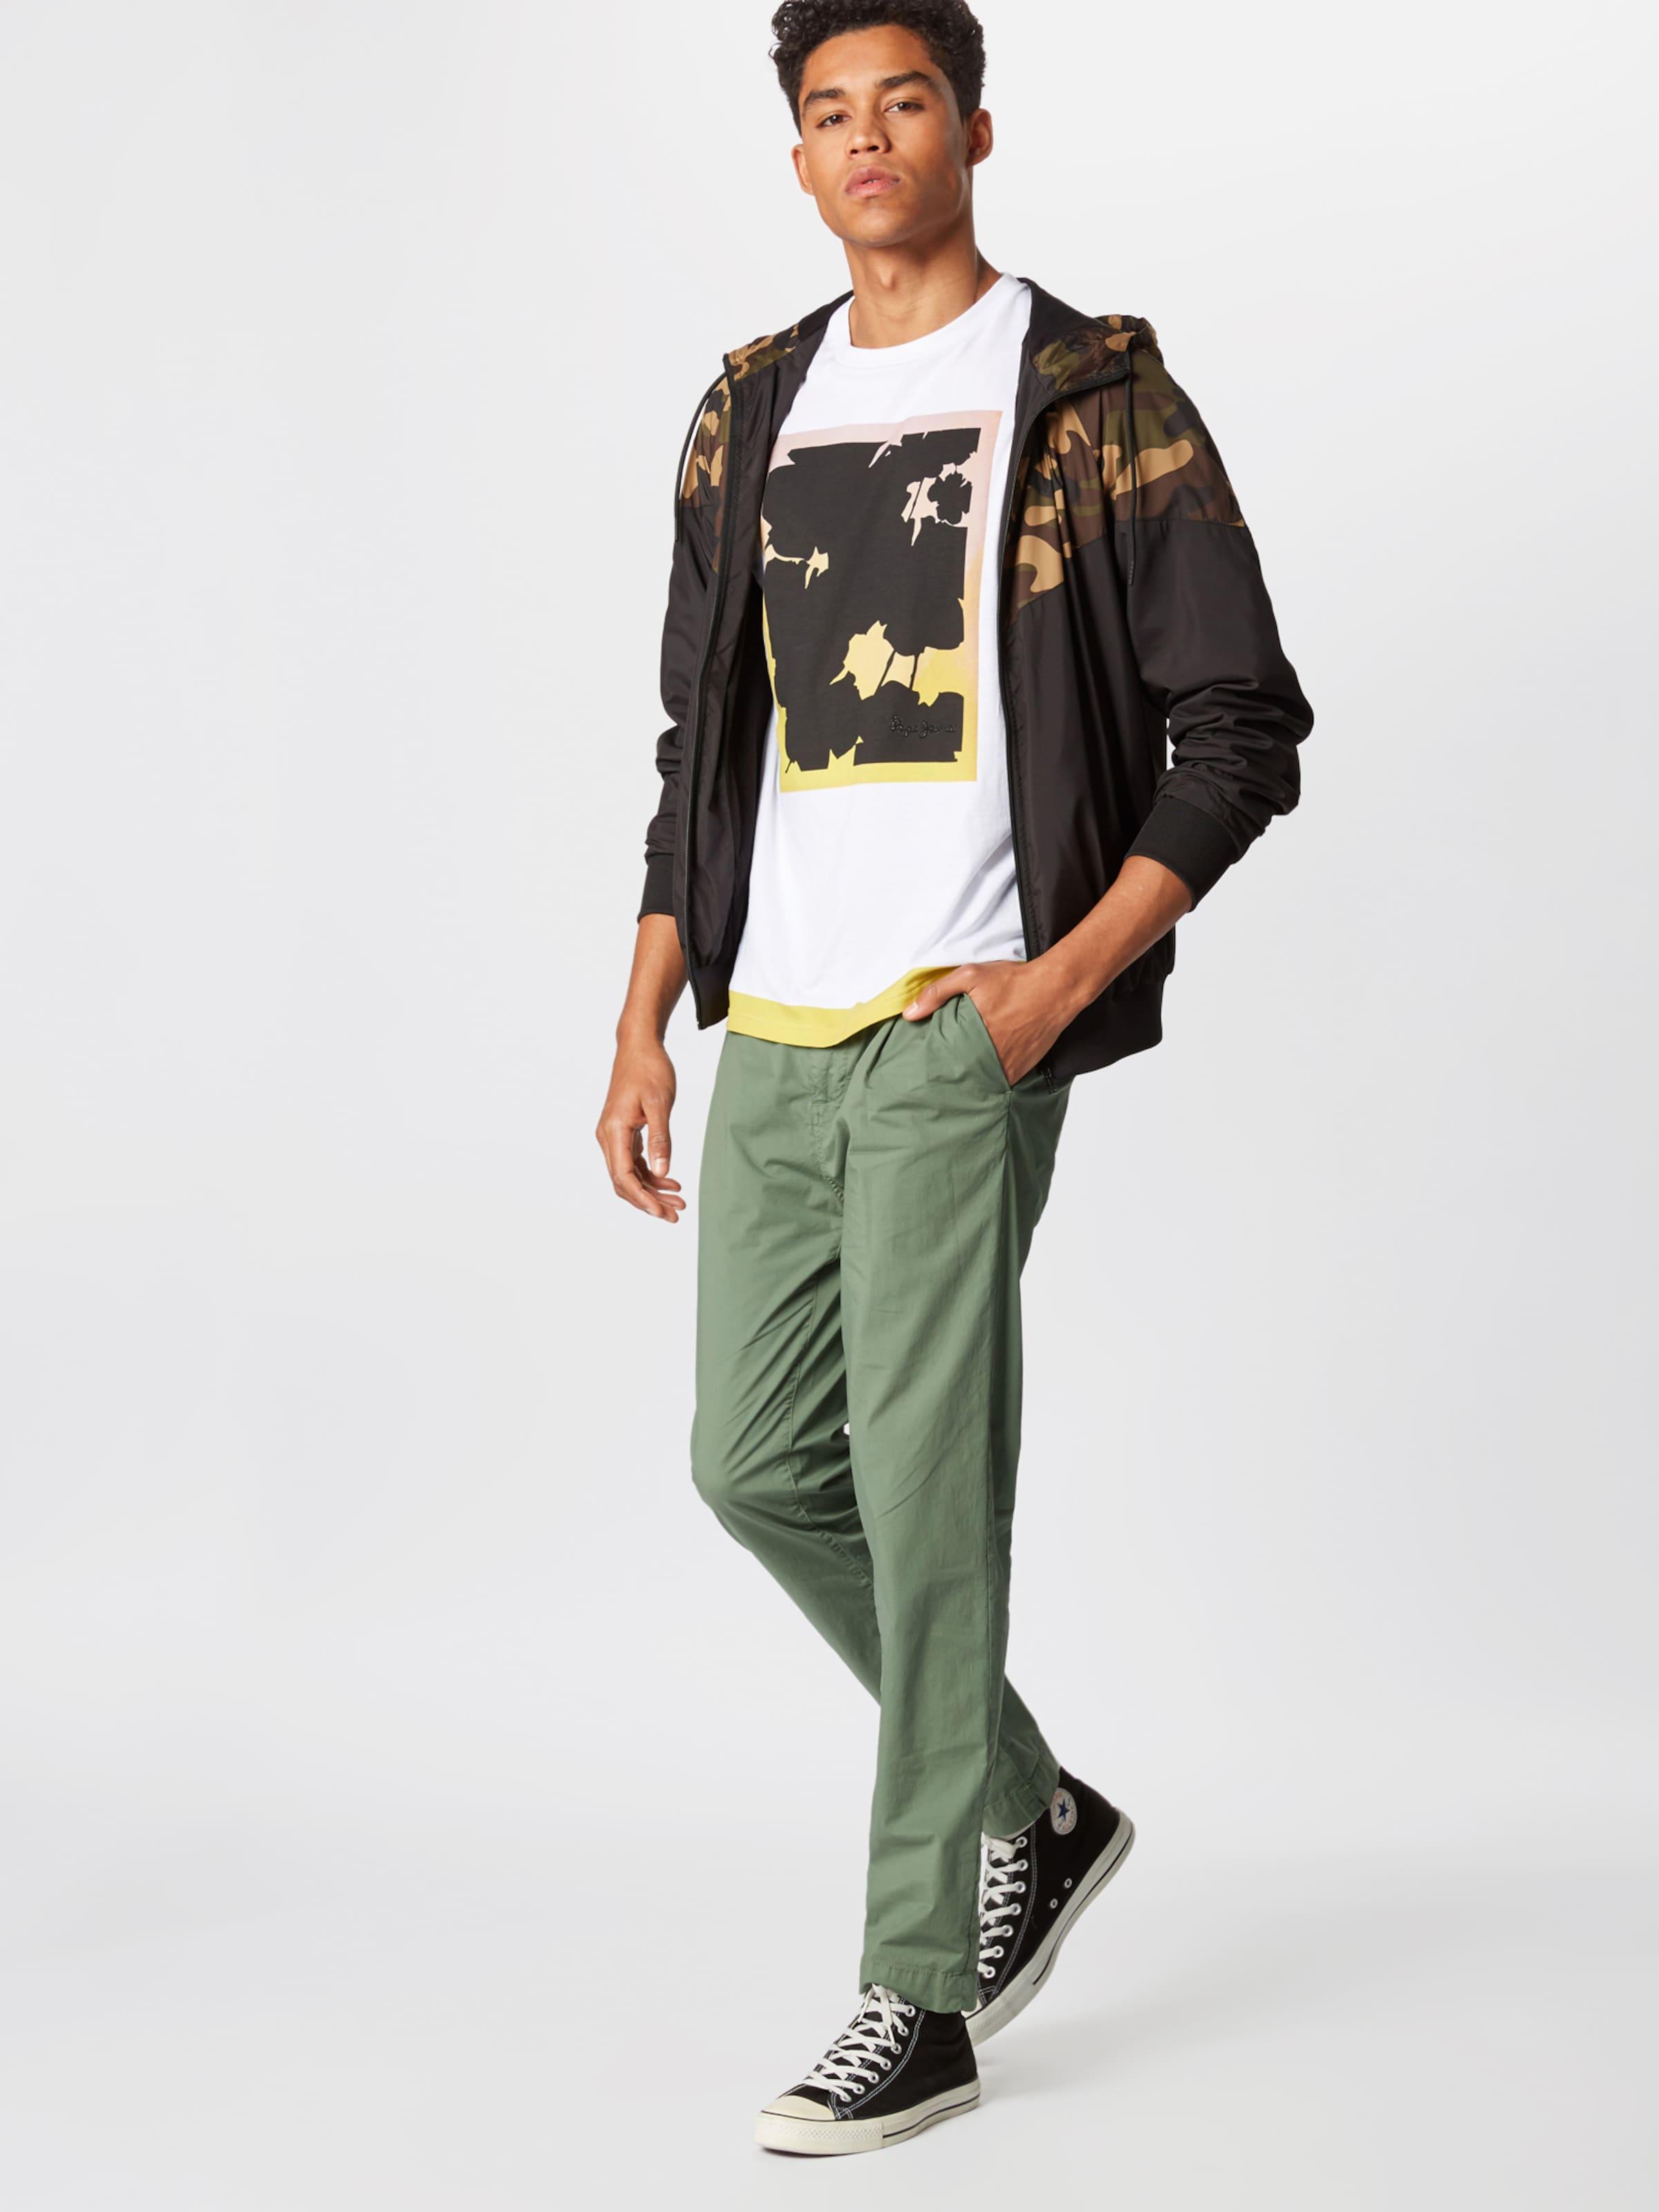 Dunkelgrün Pepe 'pierce' Jeans In Hose mw0Onv8N